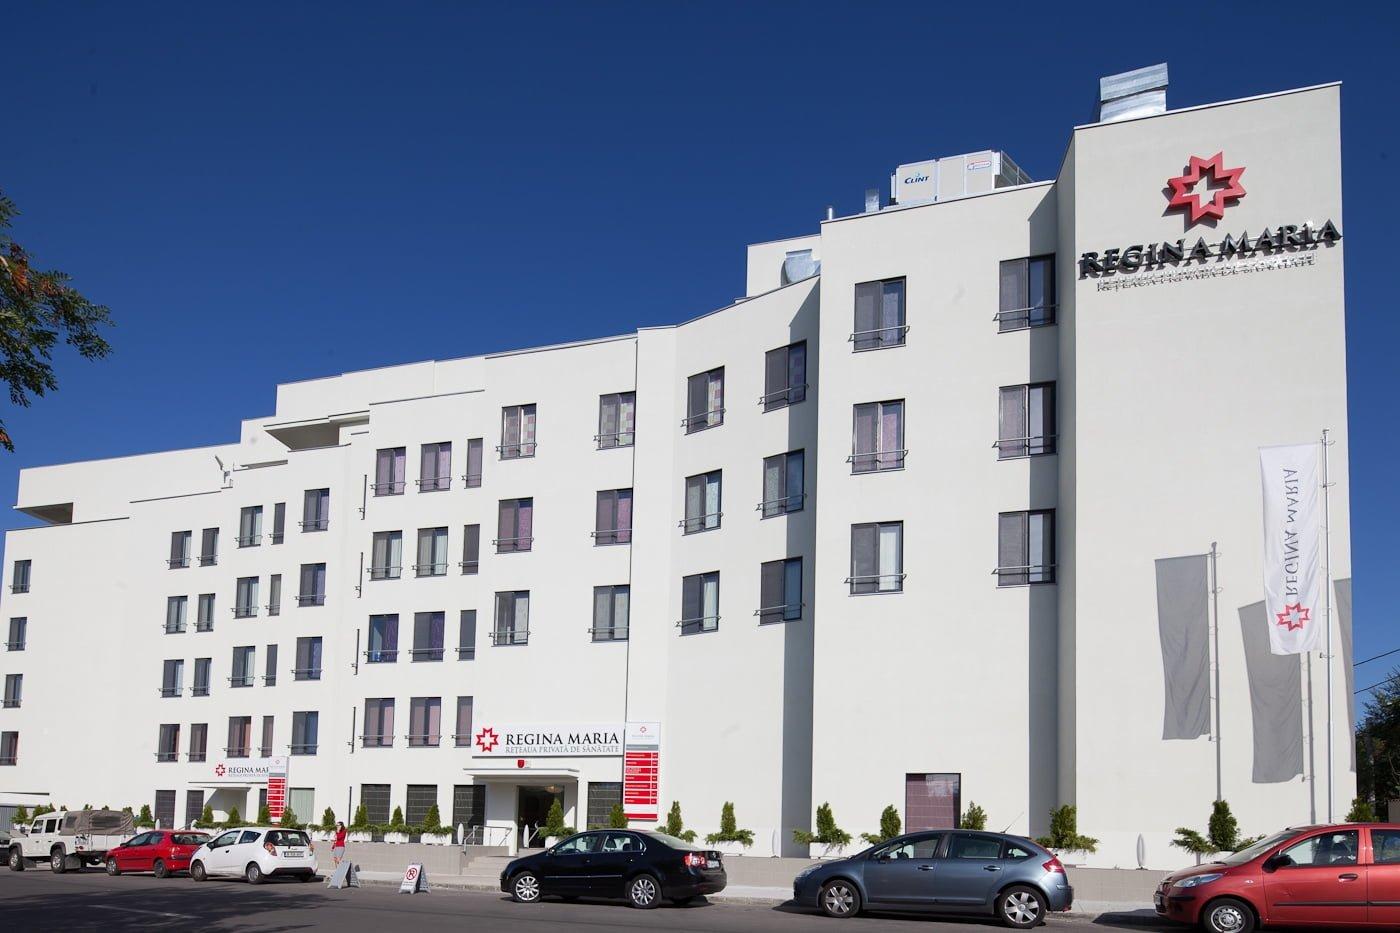 Reteaua Regina Maria a deschis Spitalul Baneasa